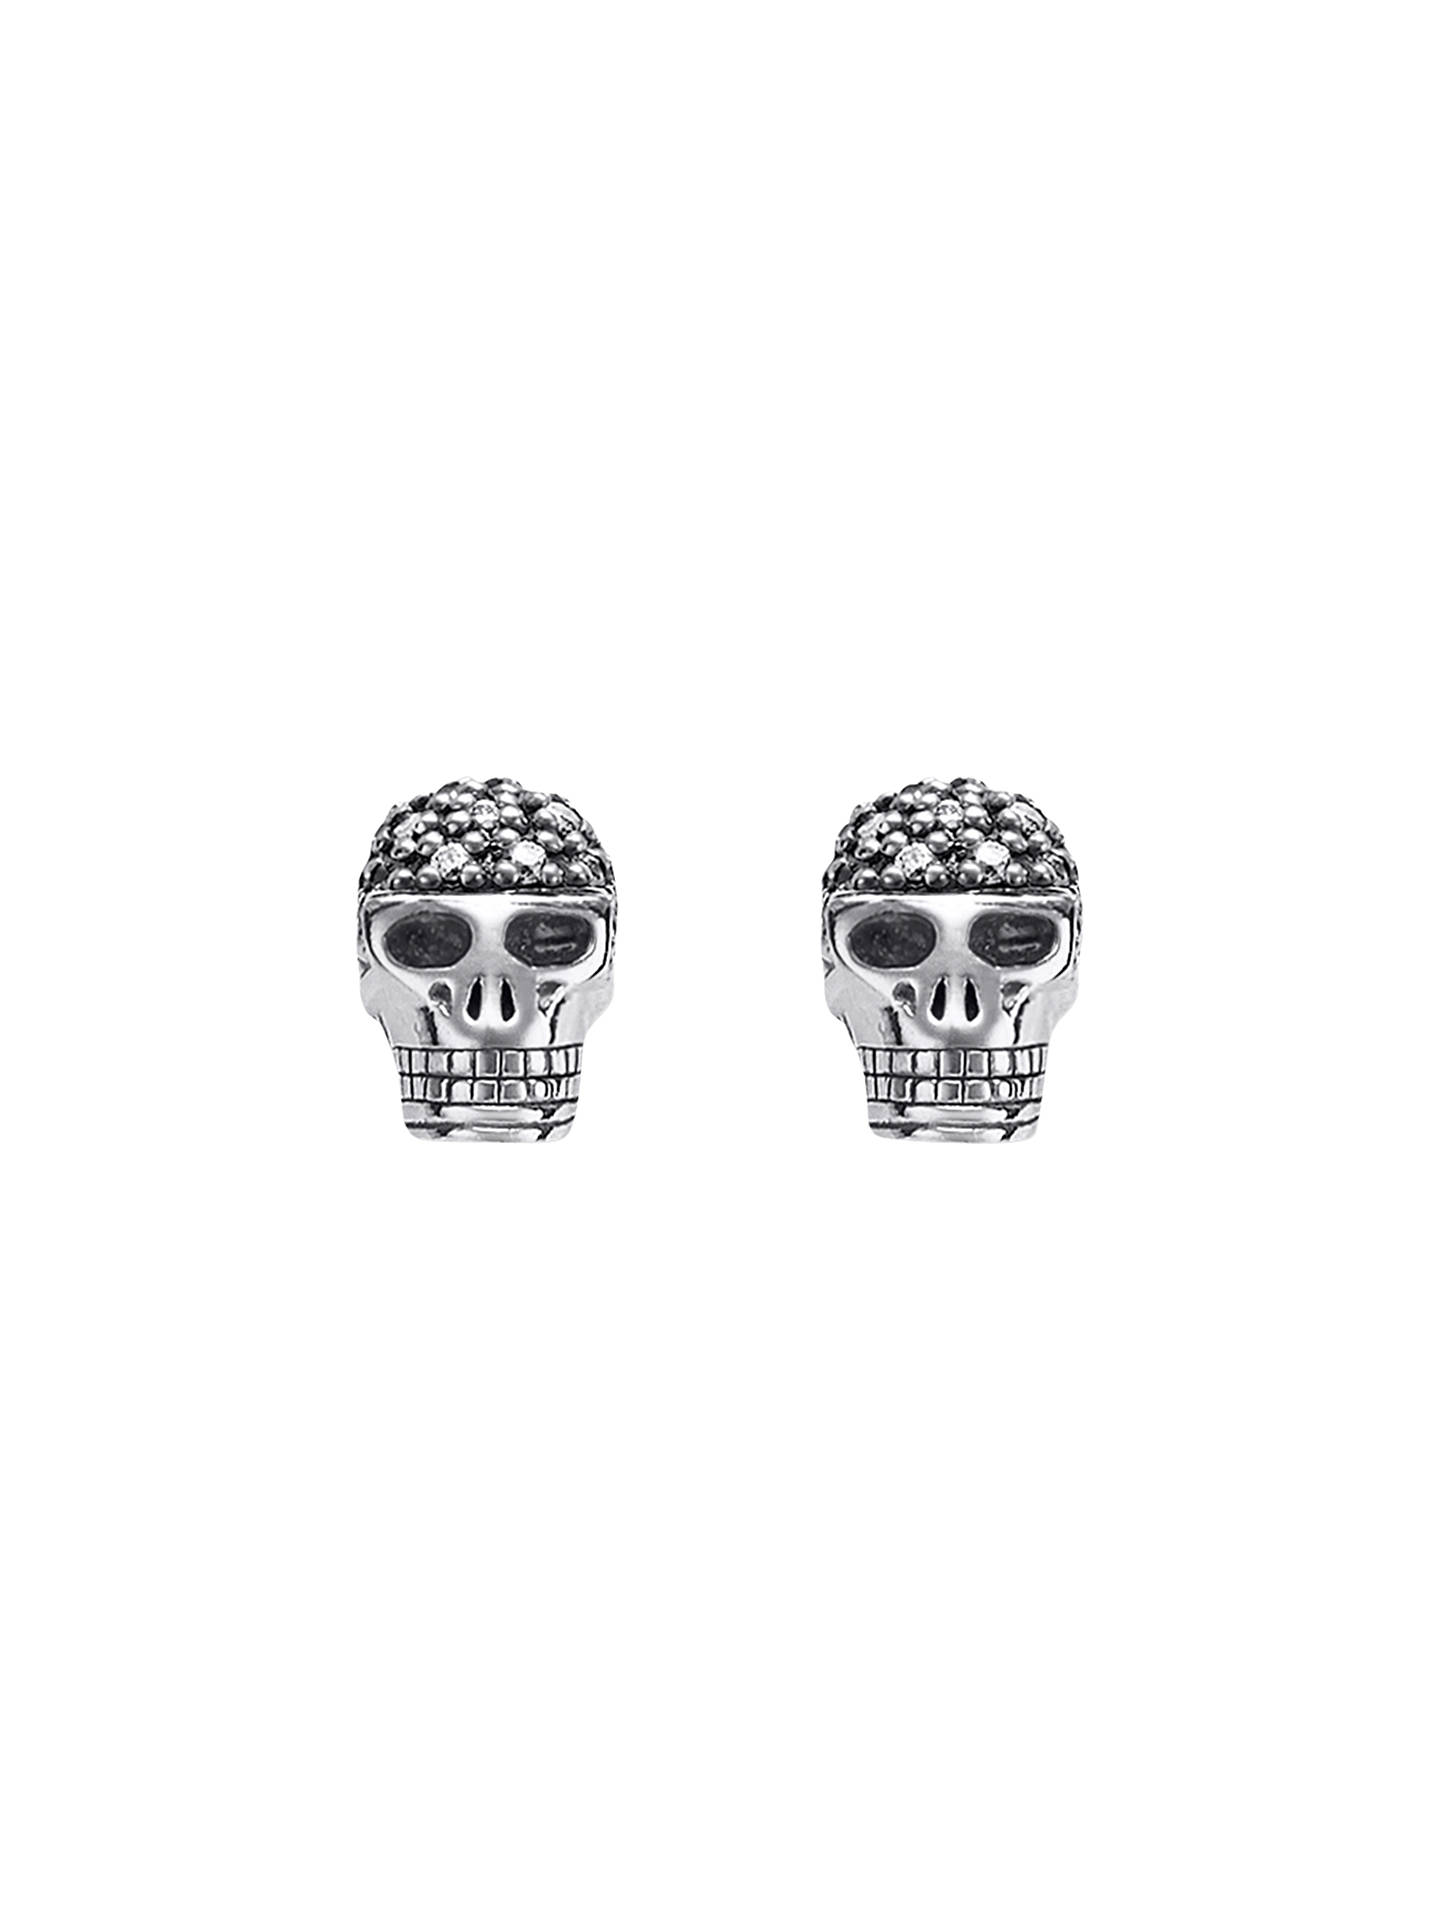 Thomas Sabo Diamond Skull Stud Earrings Silver Online At Johnlewis